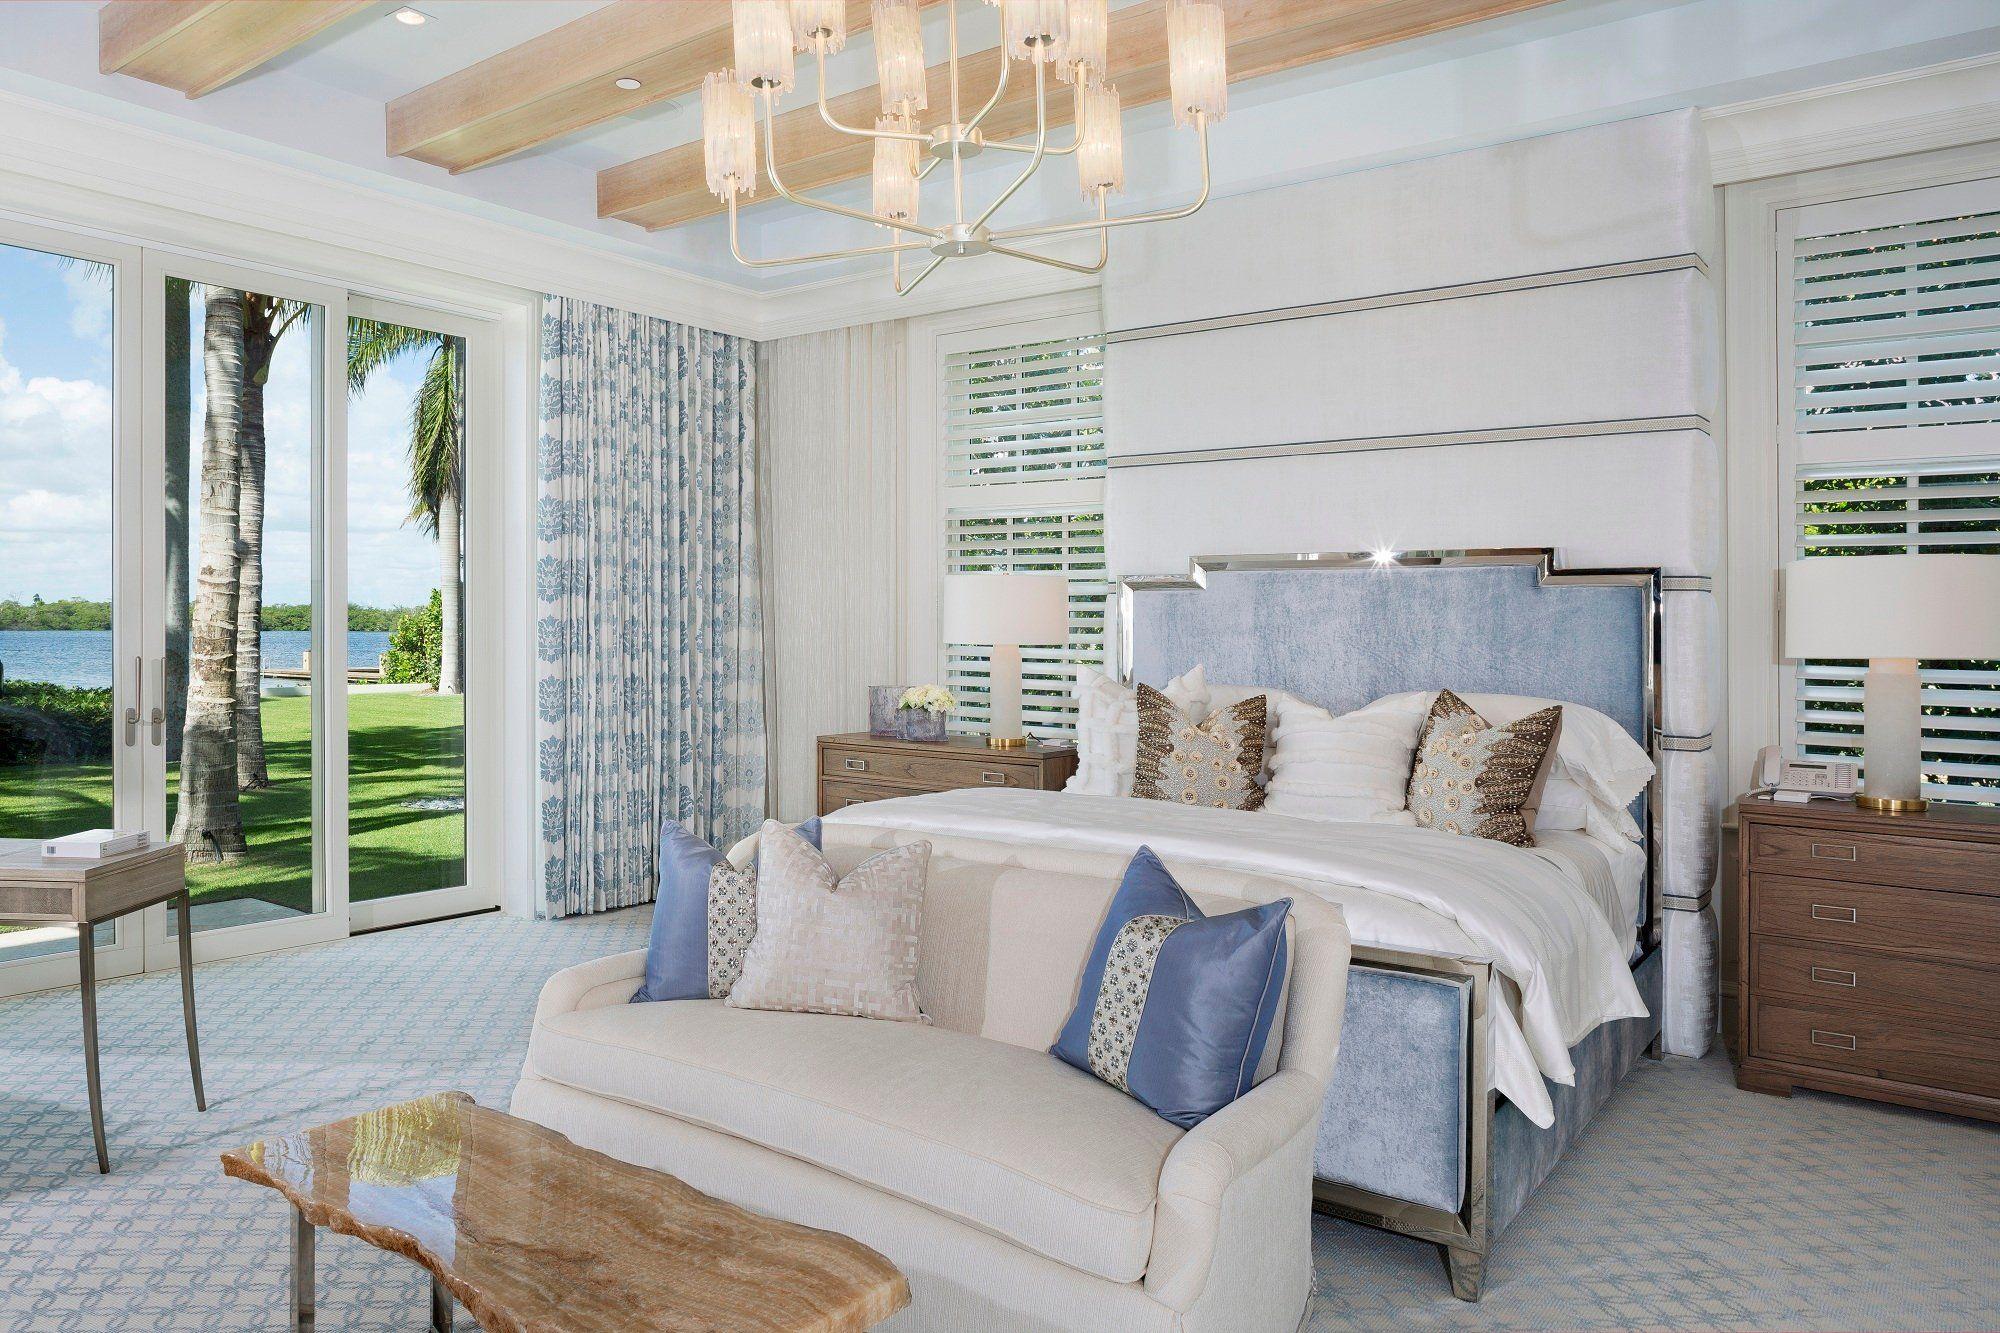 Furniture stores in st augustine fl  Pin by Studio D Art u Estate Sales on COASTAL DECOR  Pinterest